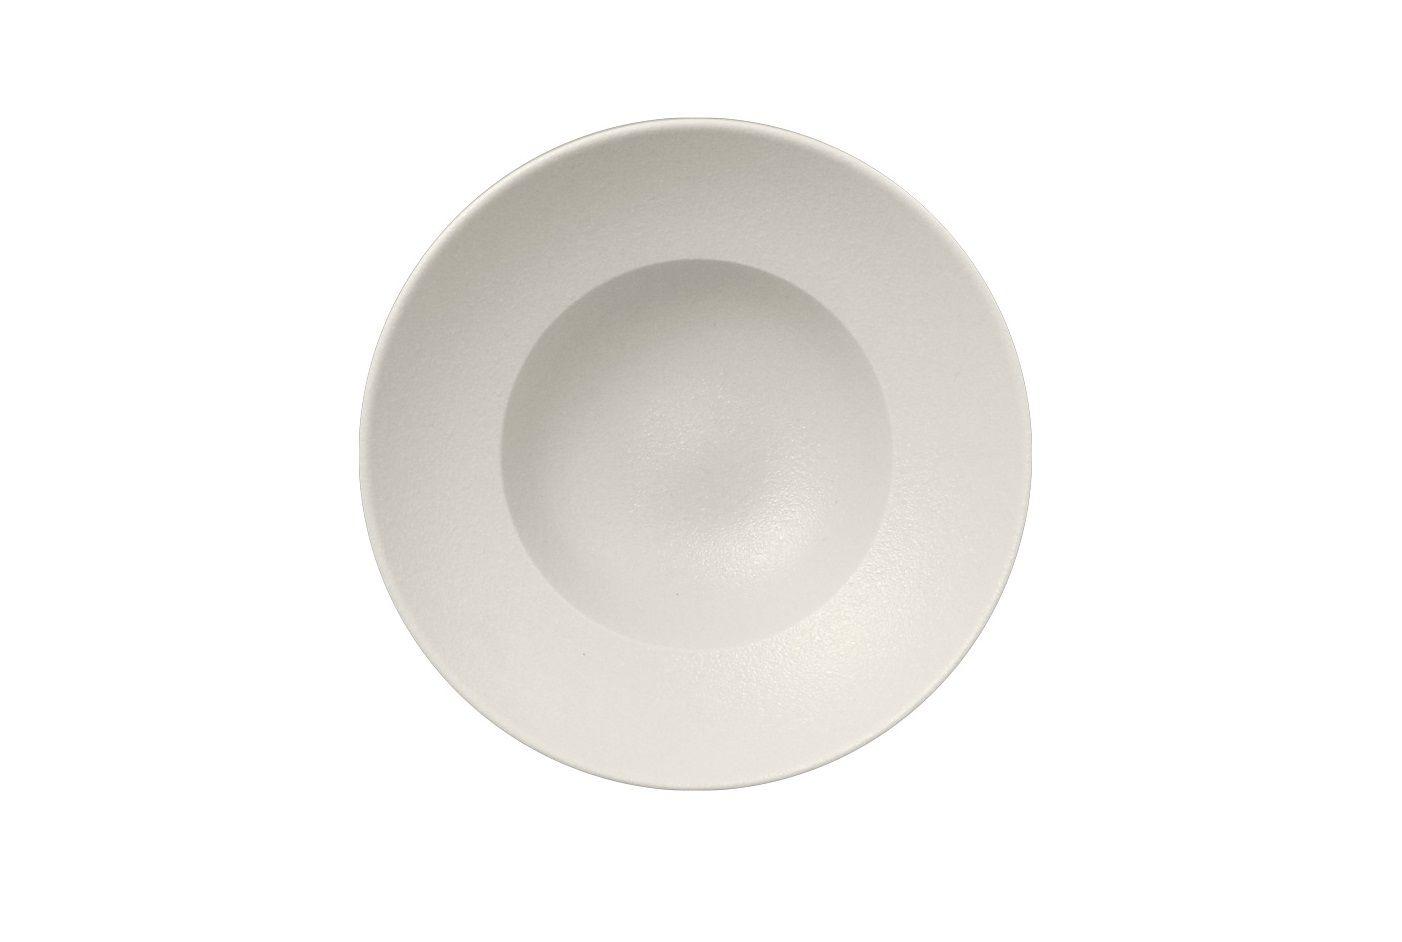 Prato de Porcelana Extra Fundo Redondo 26 Cm Branco - RAK Neo Fusion